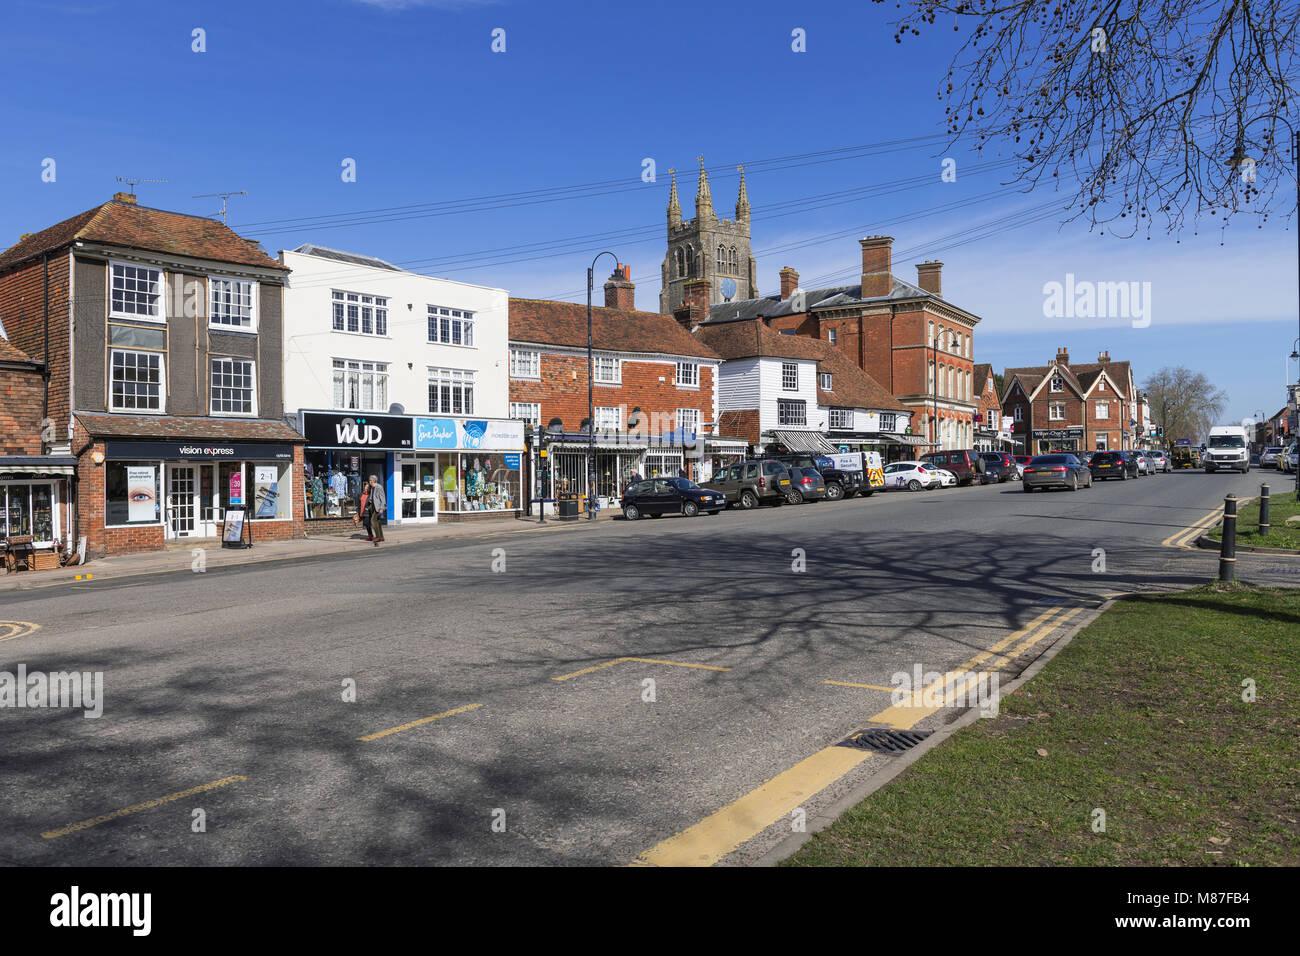 View of the high street, Tenterden Kent - Stock Image